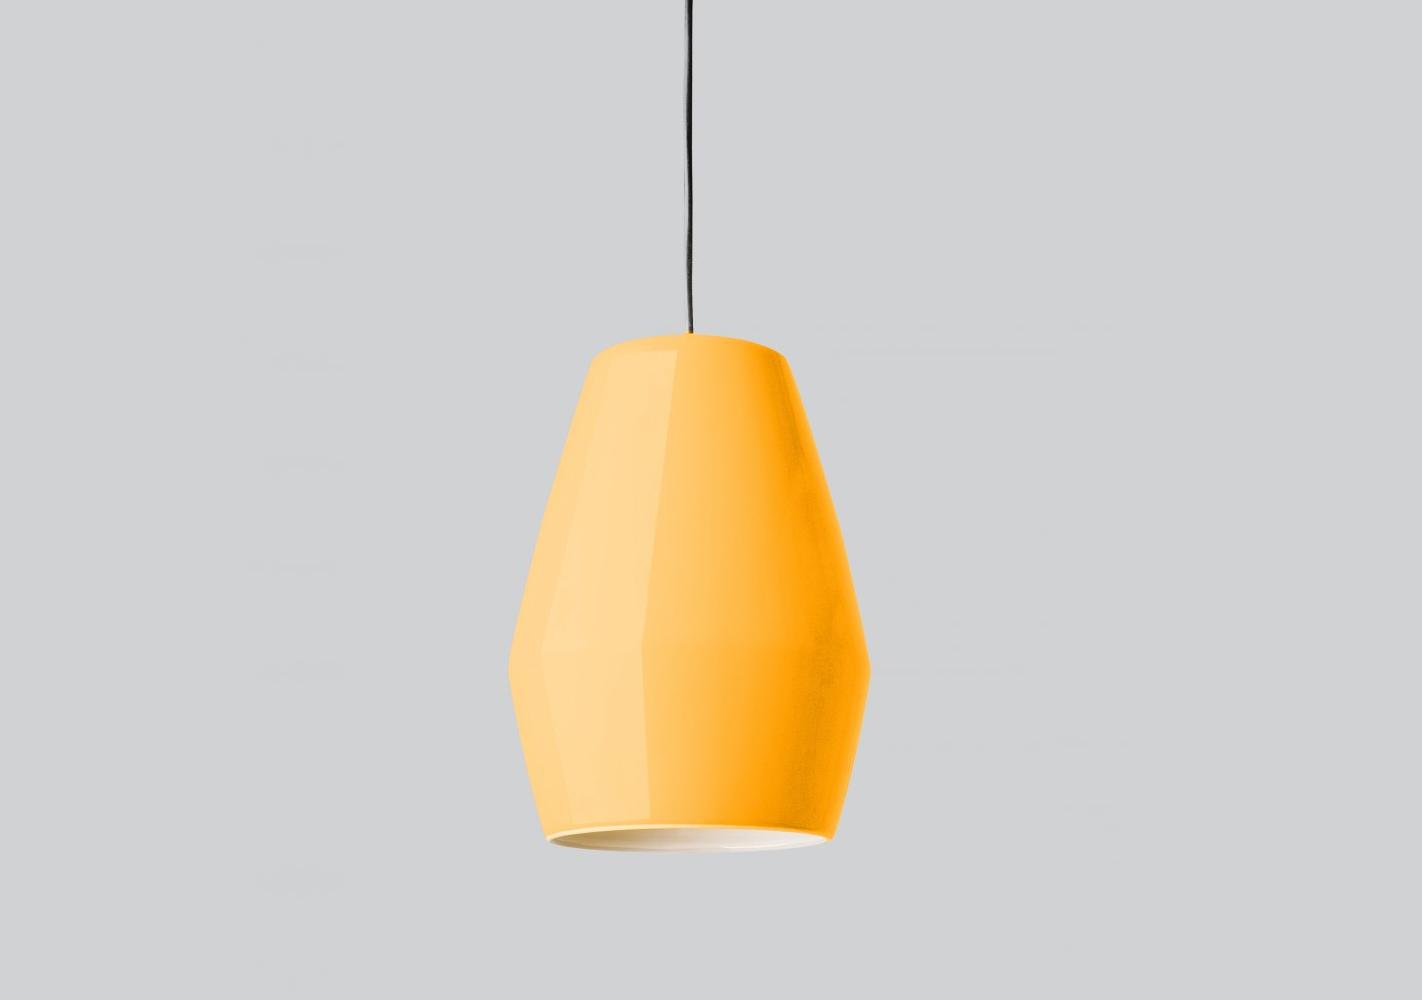 Suspension Bell - NORTHERN LIGHTING